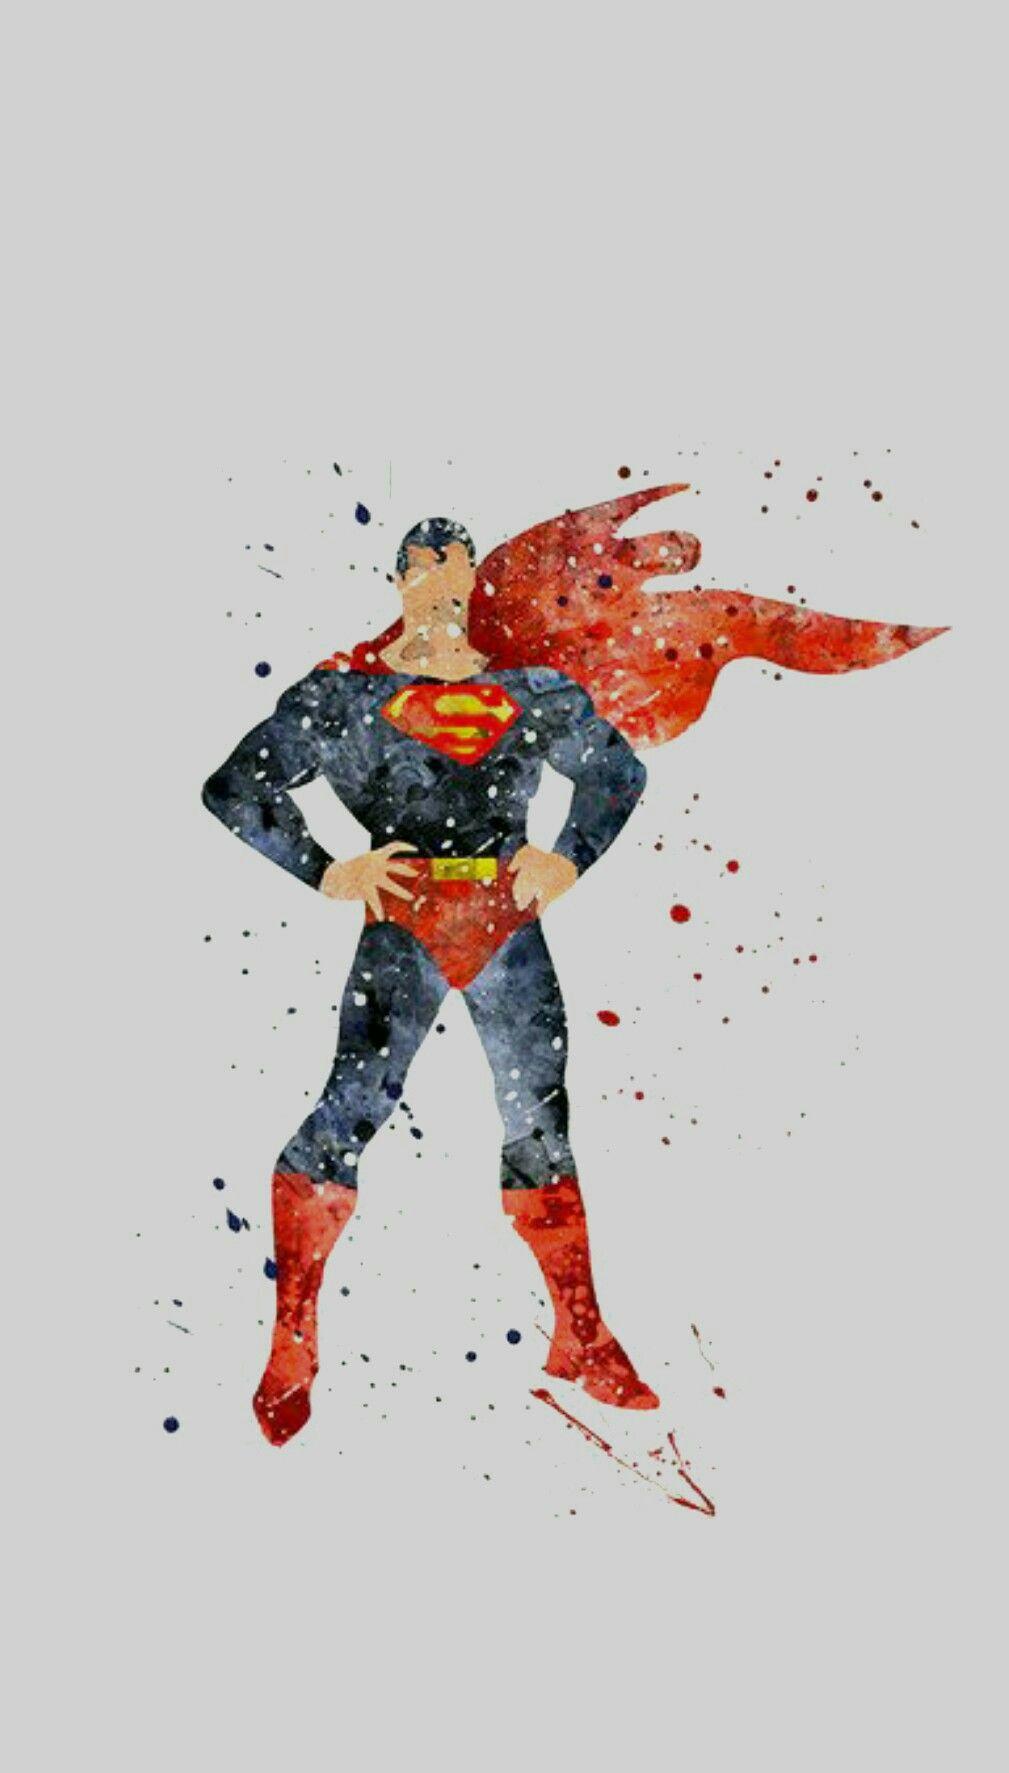 Wallpapers Tumblr Super Hero Papel De Parede De Super Herois